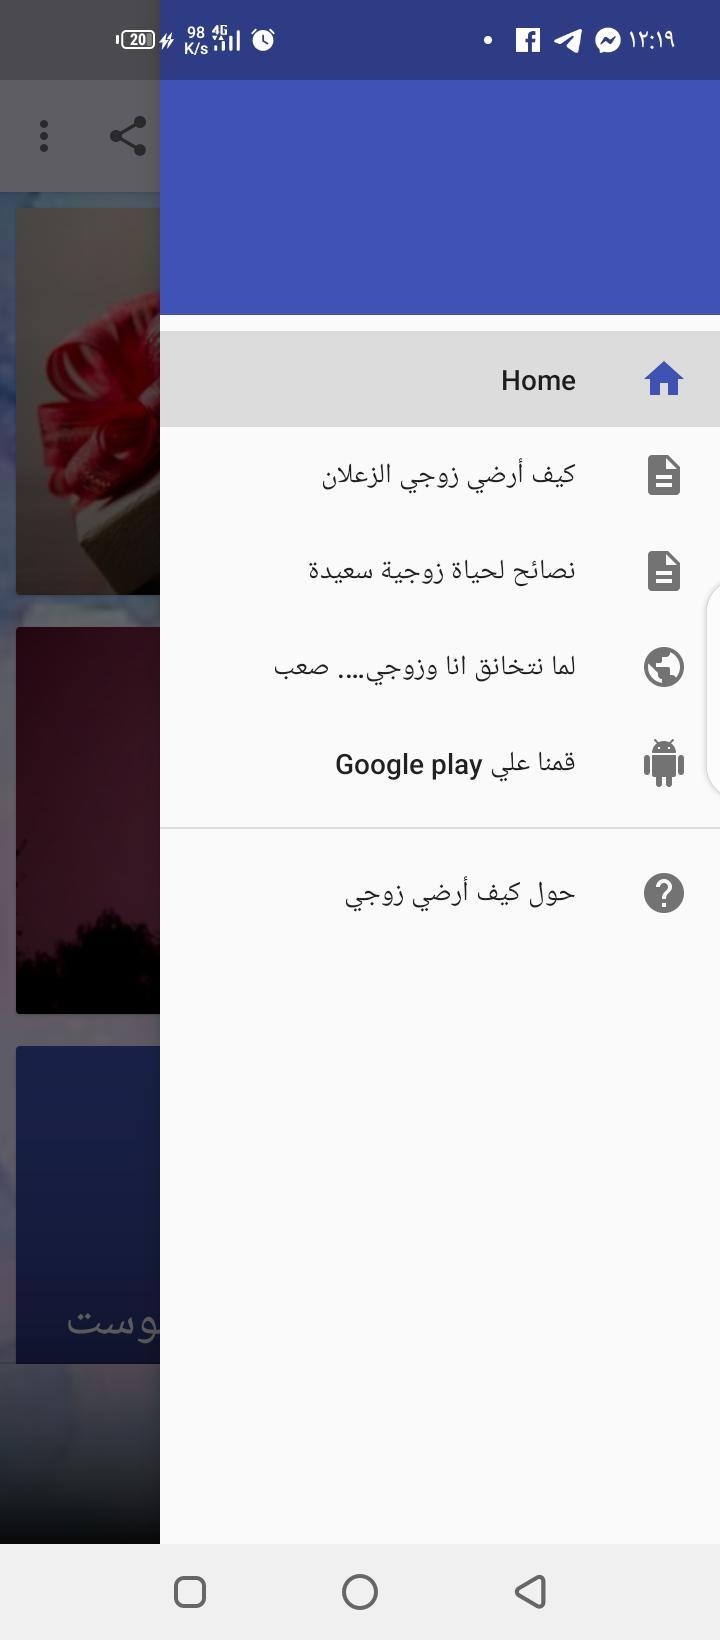 كيف أرضي زوجي الزعلان نصائح2021 Para Android Apk Baixar